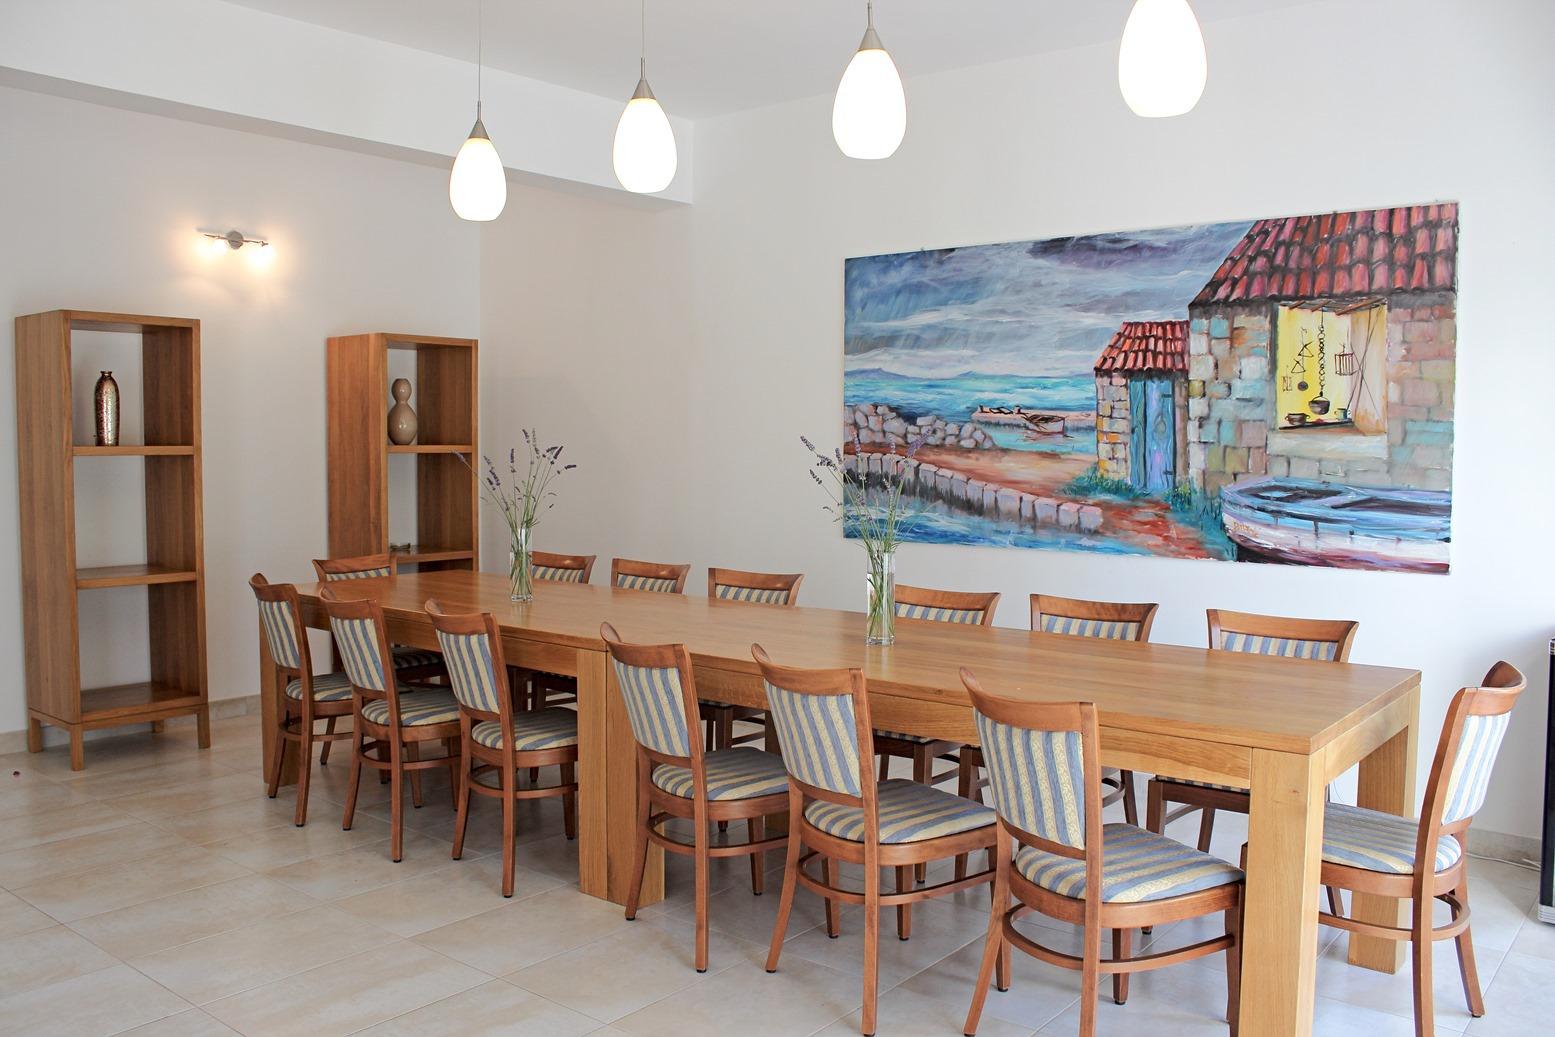 6018 - Mirca - Hiše za počitek, vile Hrvaška - H(14+2): jedilnica